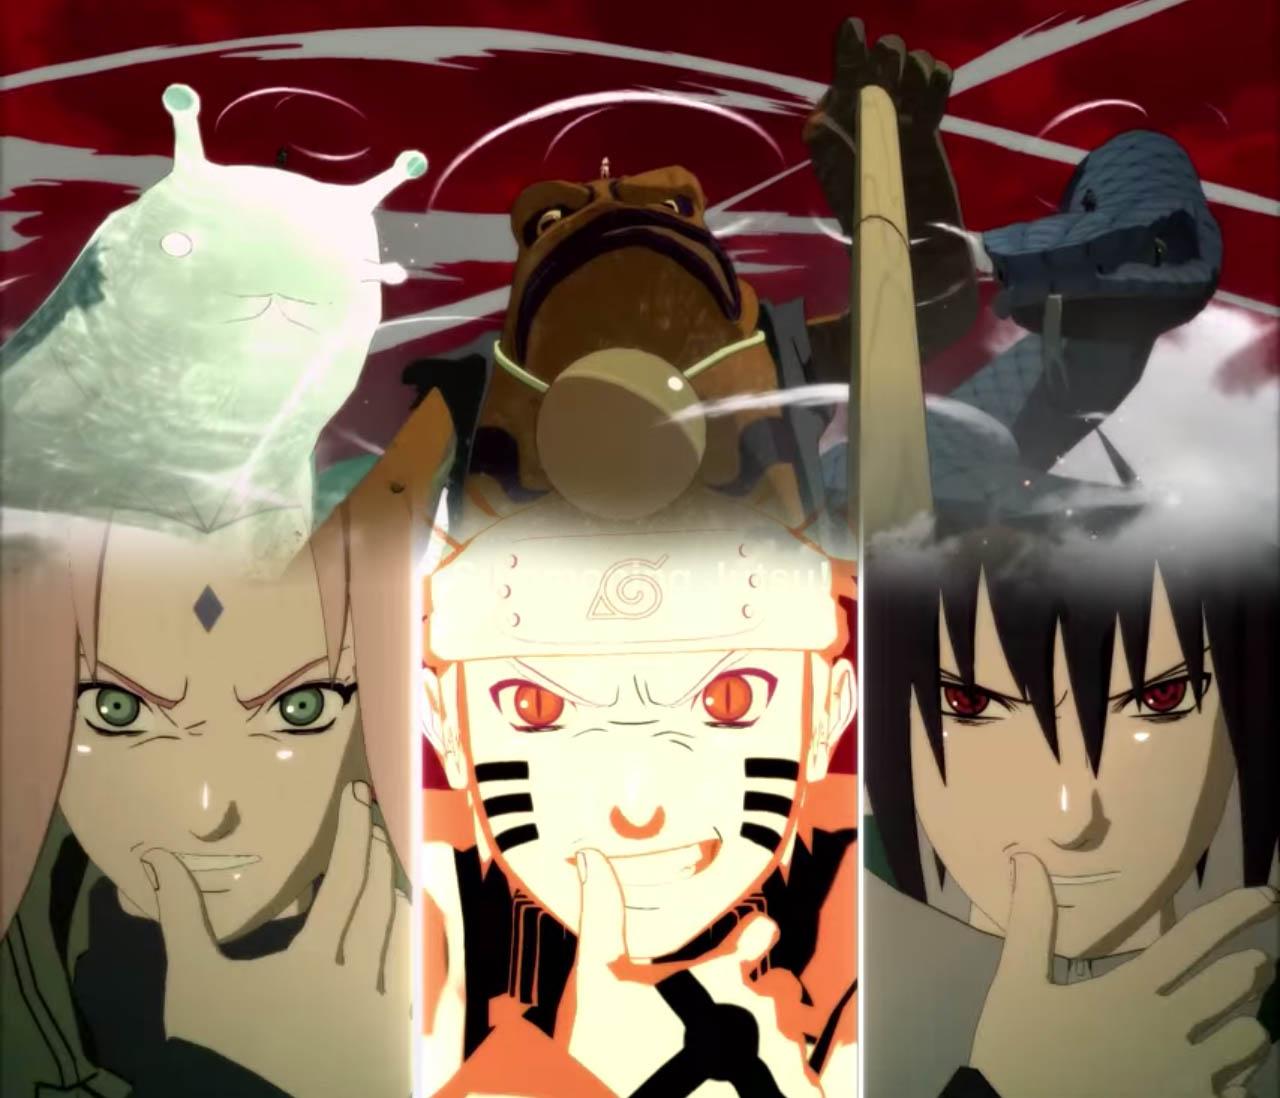 Naruto Shippuden Ultimate Ninja Storm 4 Naruto summons  Gamakichi, Sakura summons Katsuyu, Sasuke summons Aoda